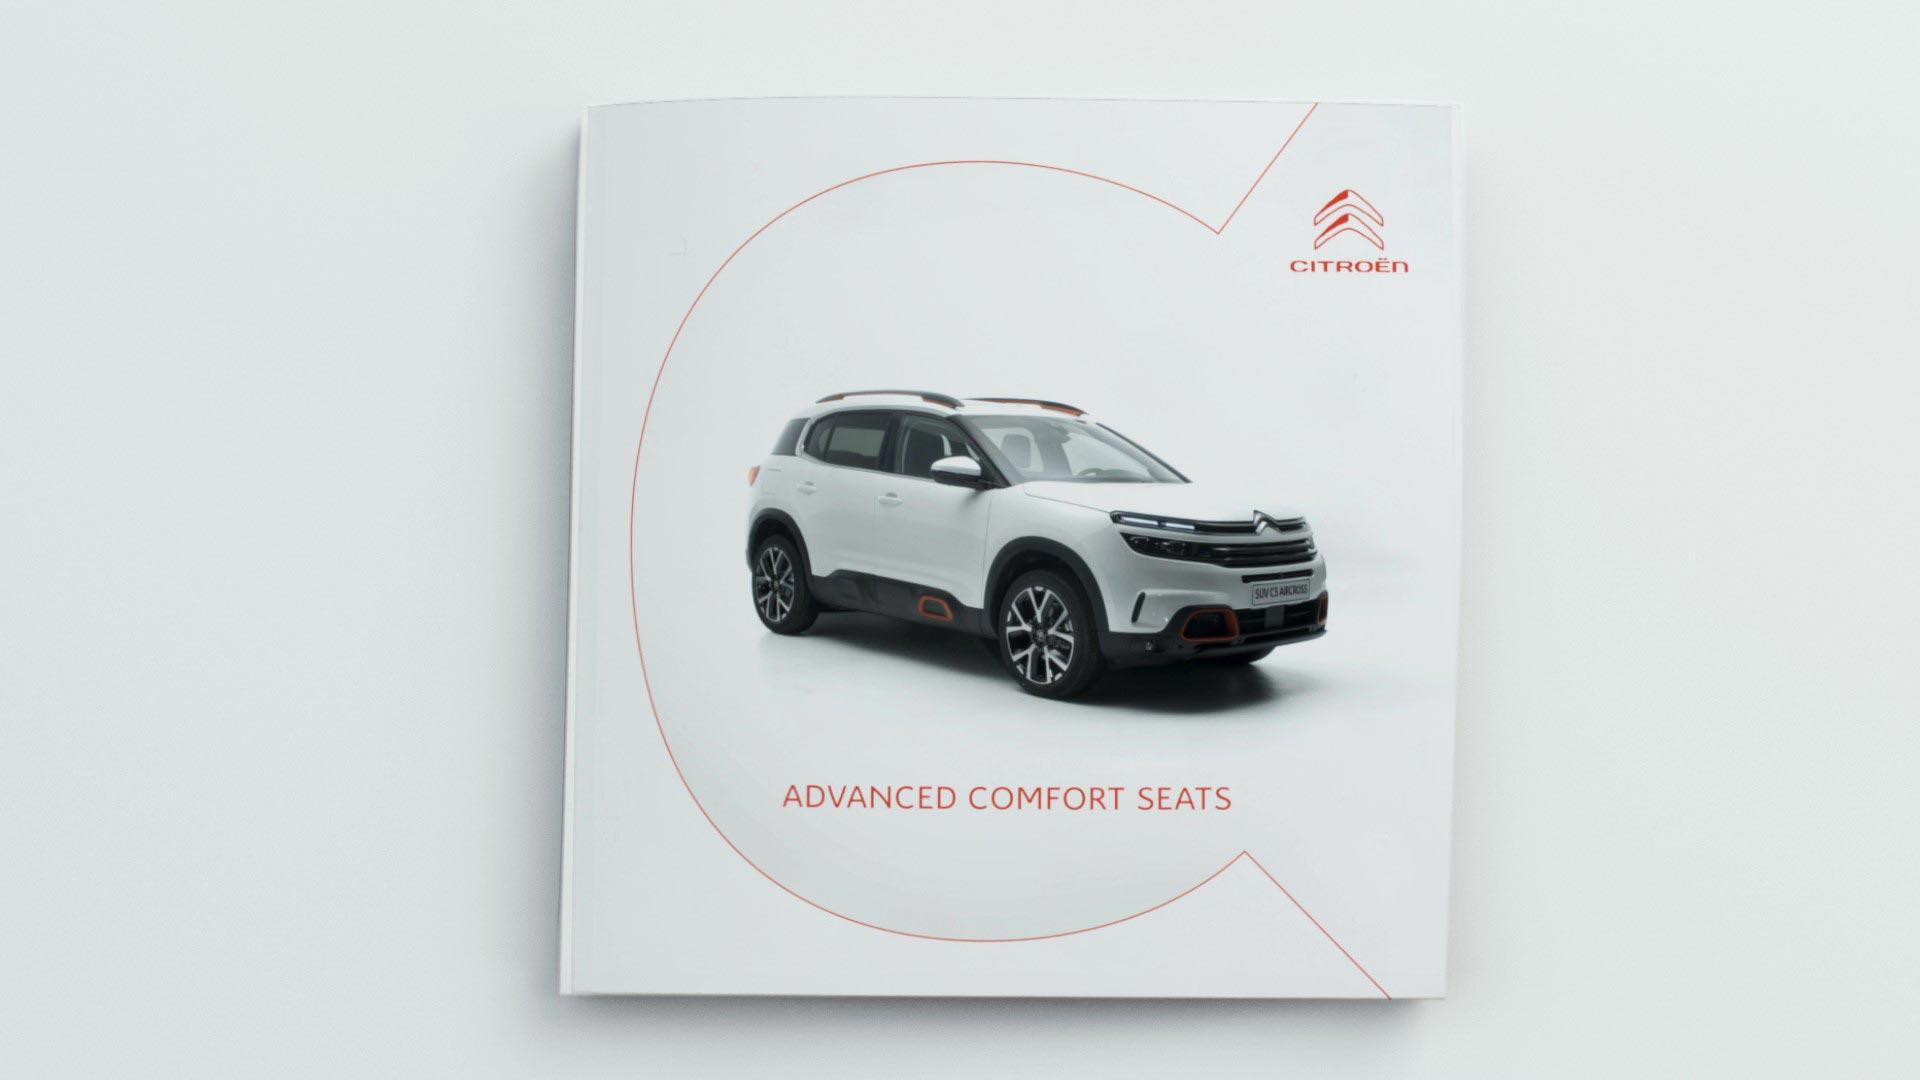 Citroën C5 Aircross SUV - Сиденья Advanced Comfort